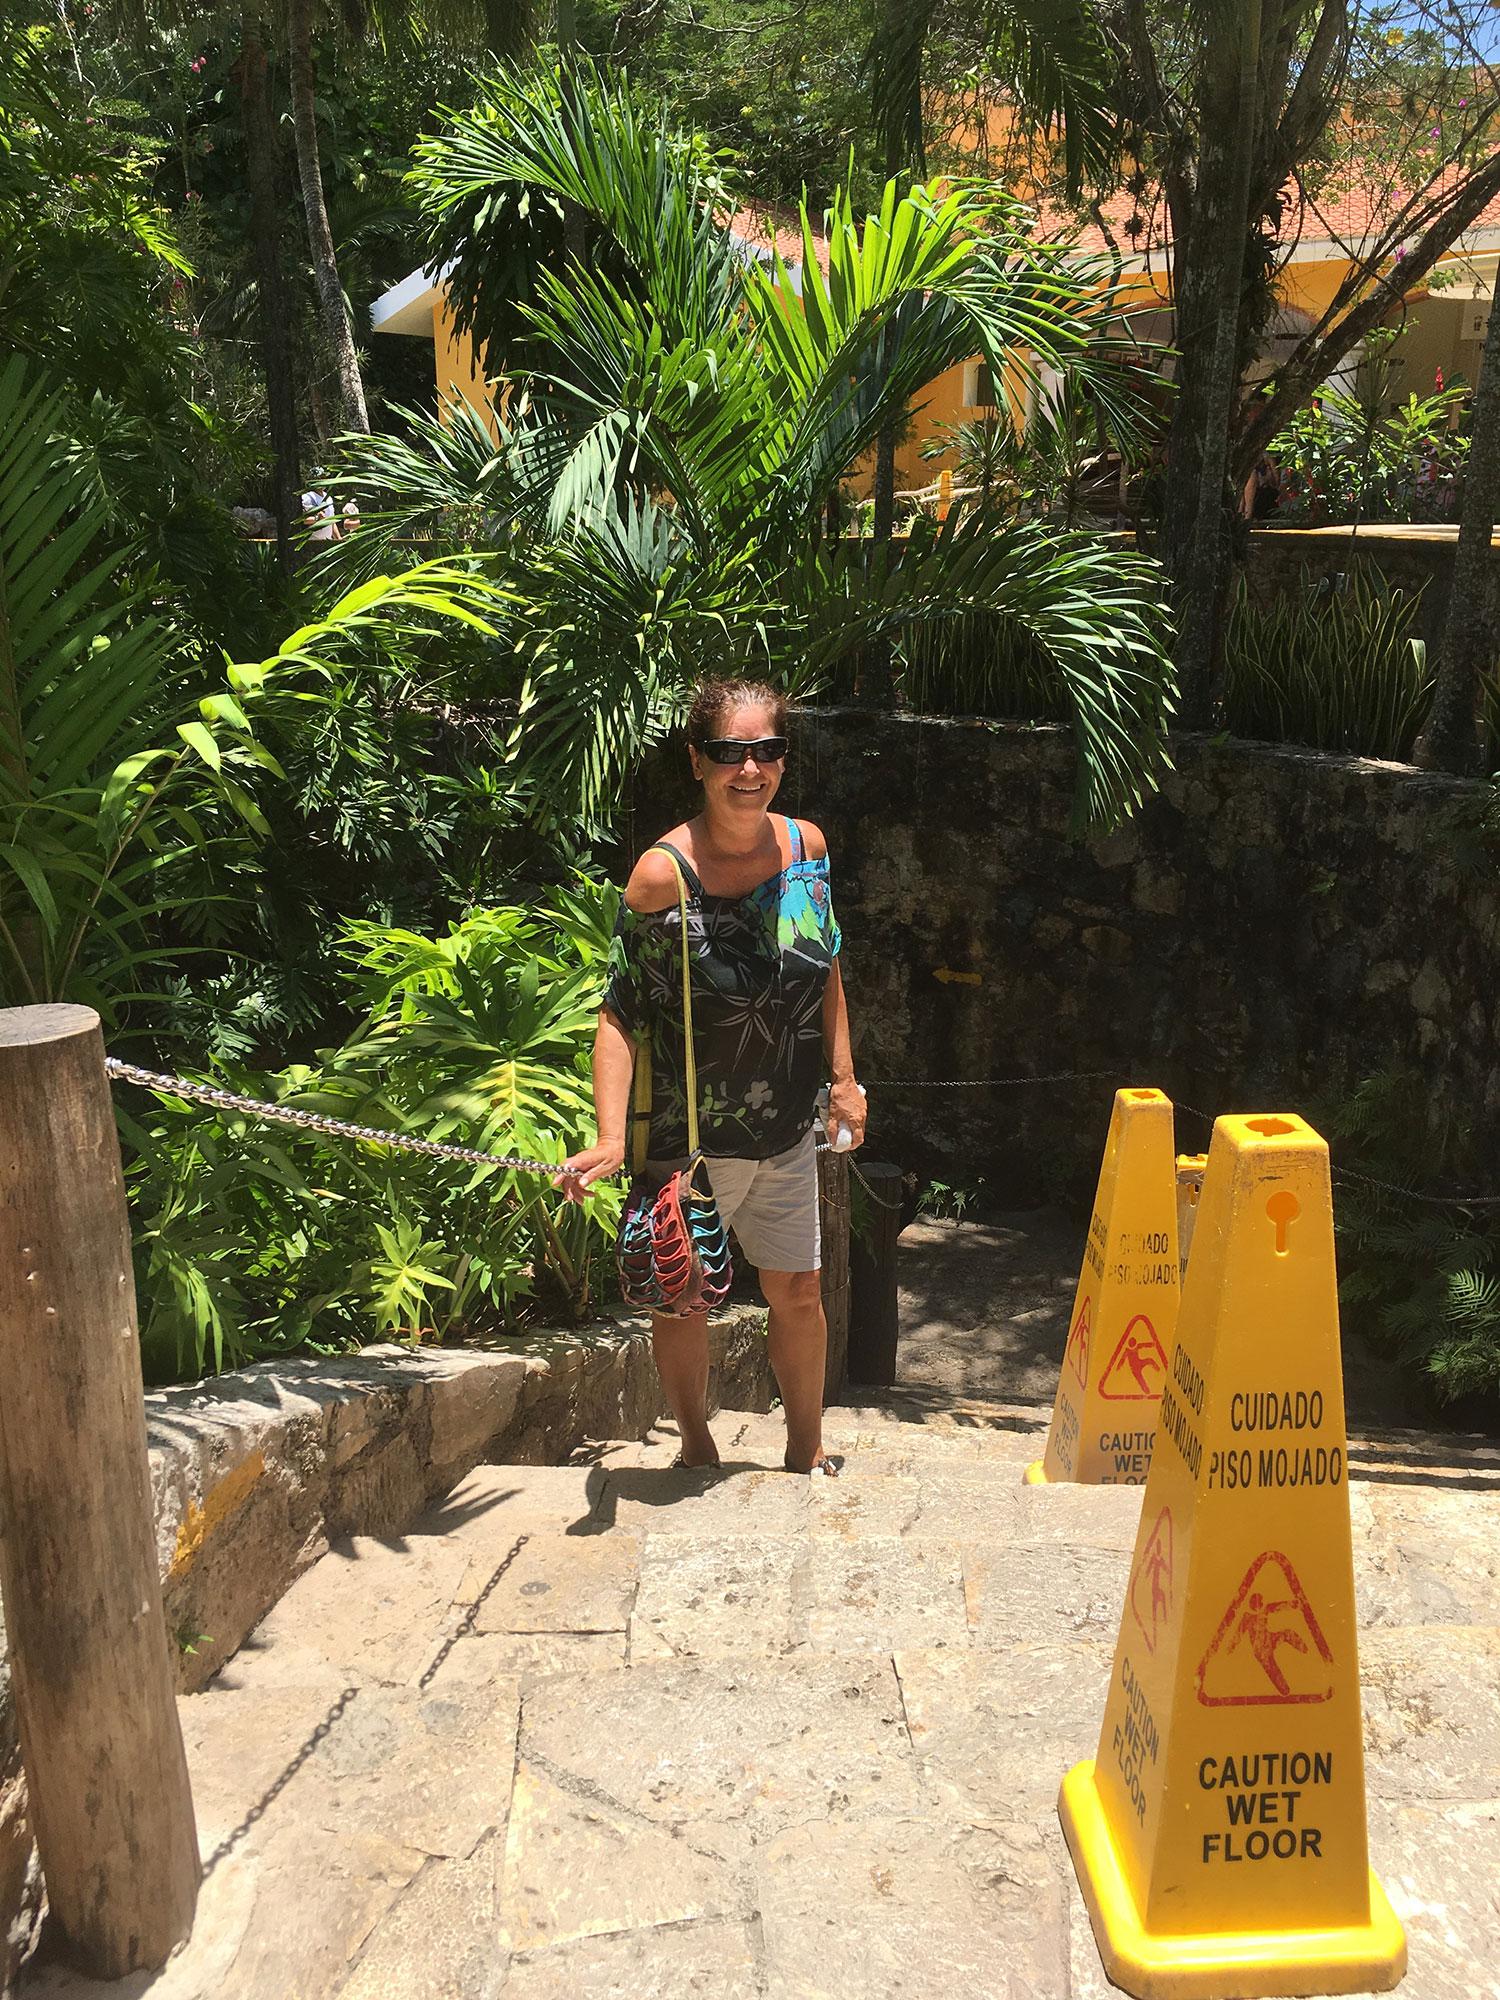 Hammocks_and_Ruins_What_to_Do_Mexico_Mayan_pyramid_cenote_Ik_Kil_24.jpg